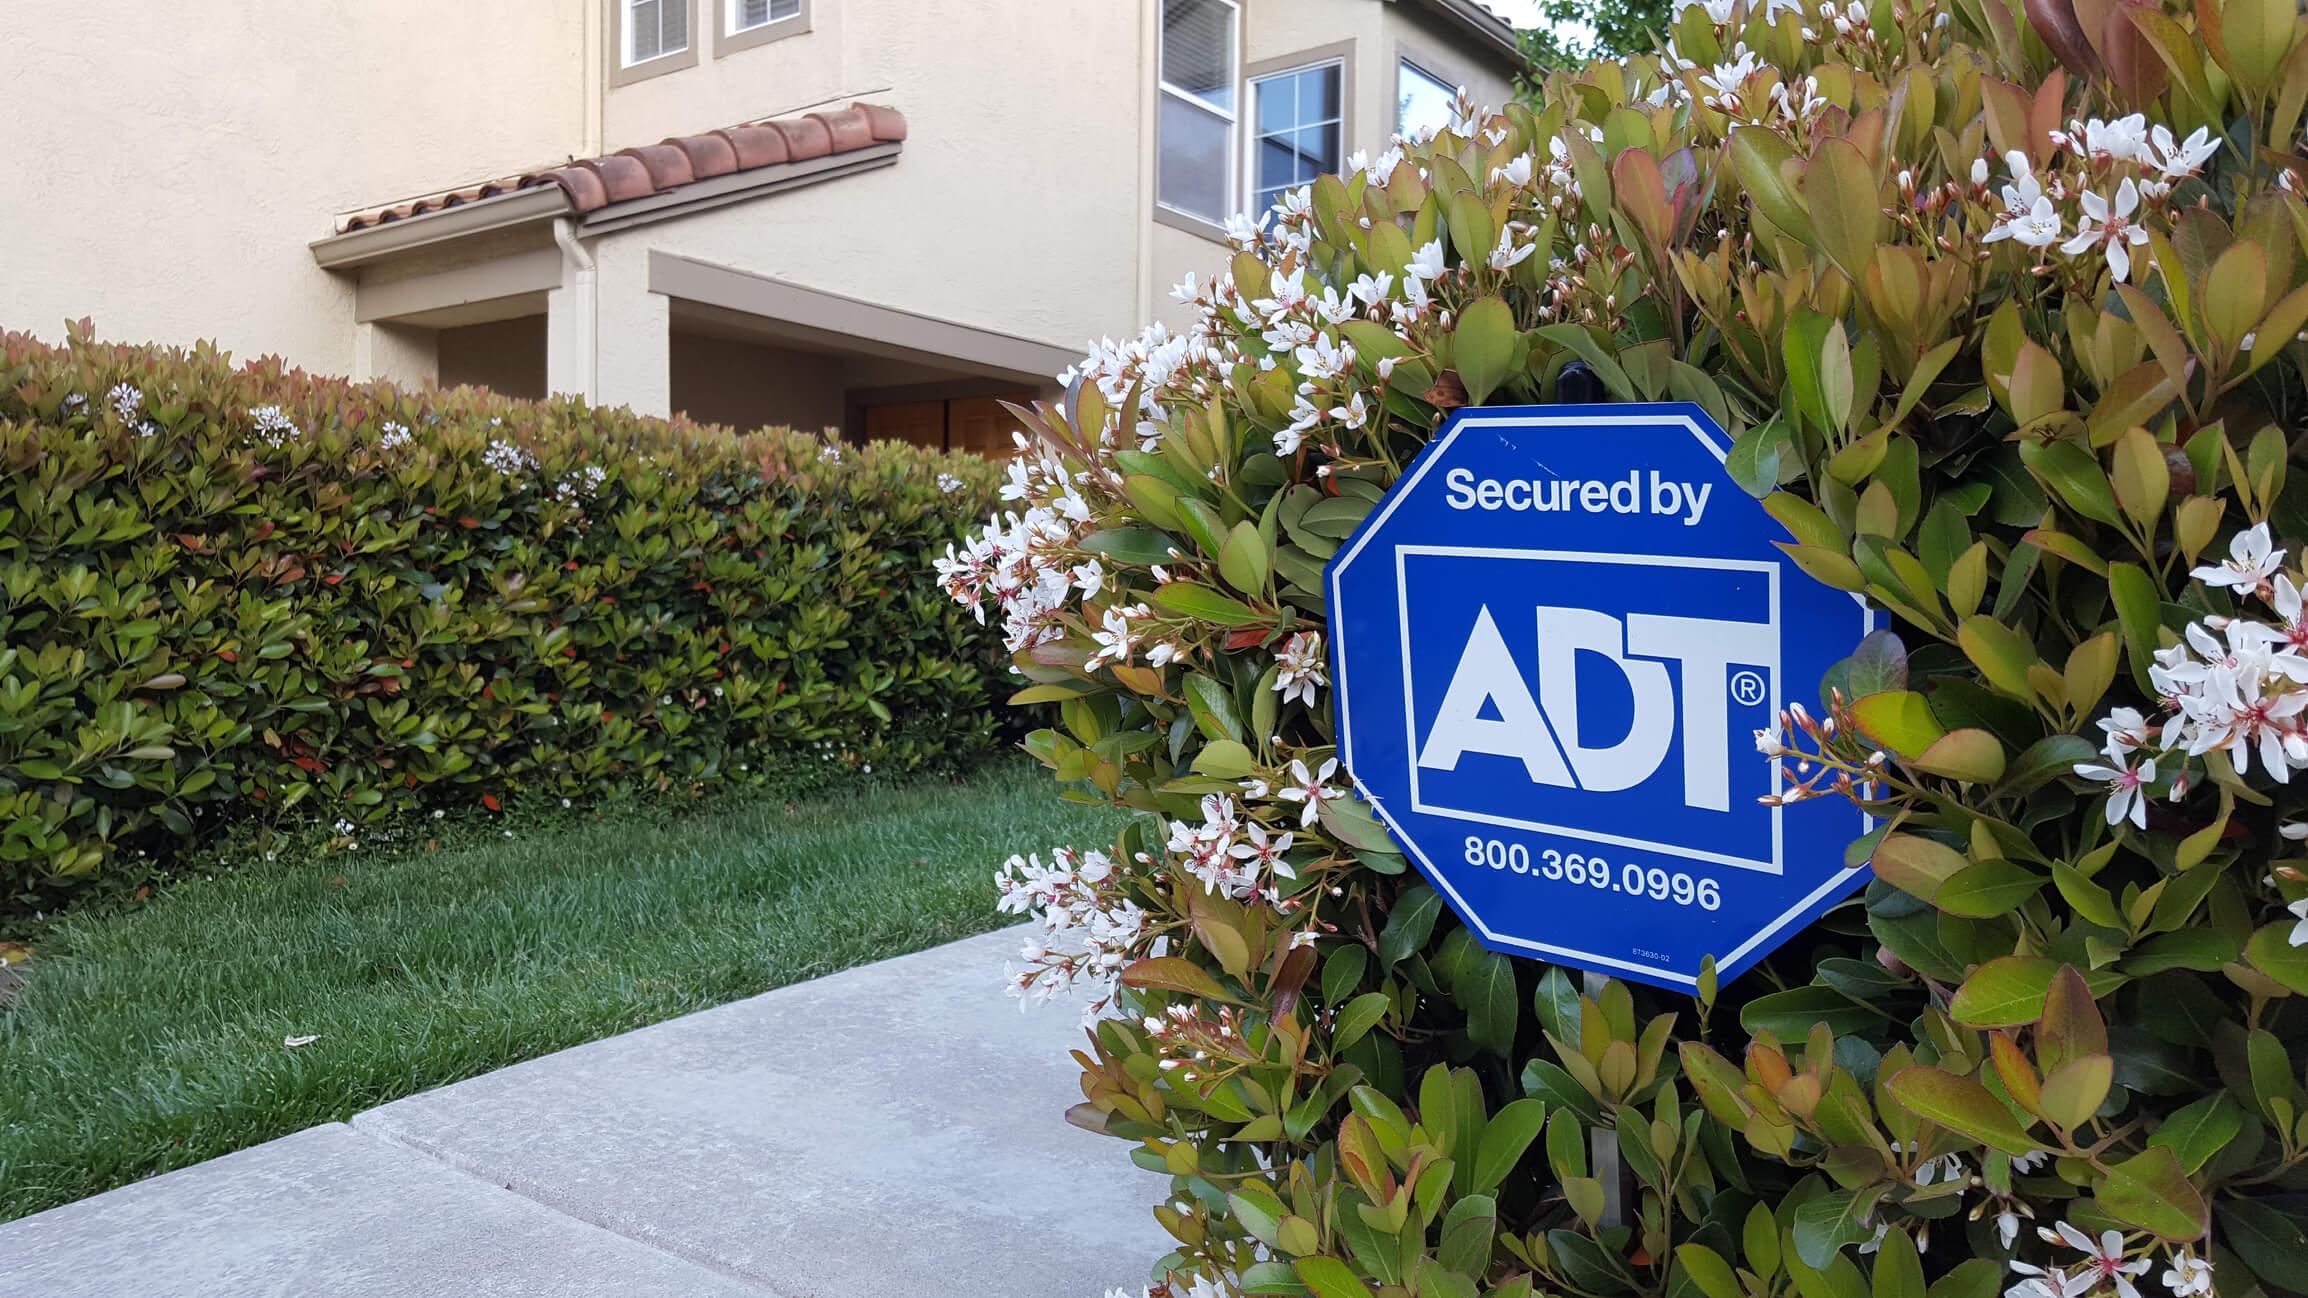 ADT sign in a bush near a driveway